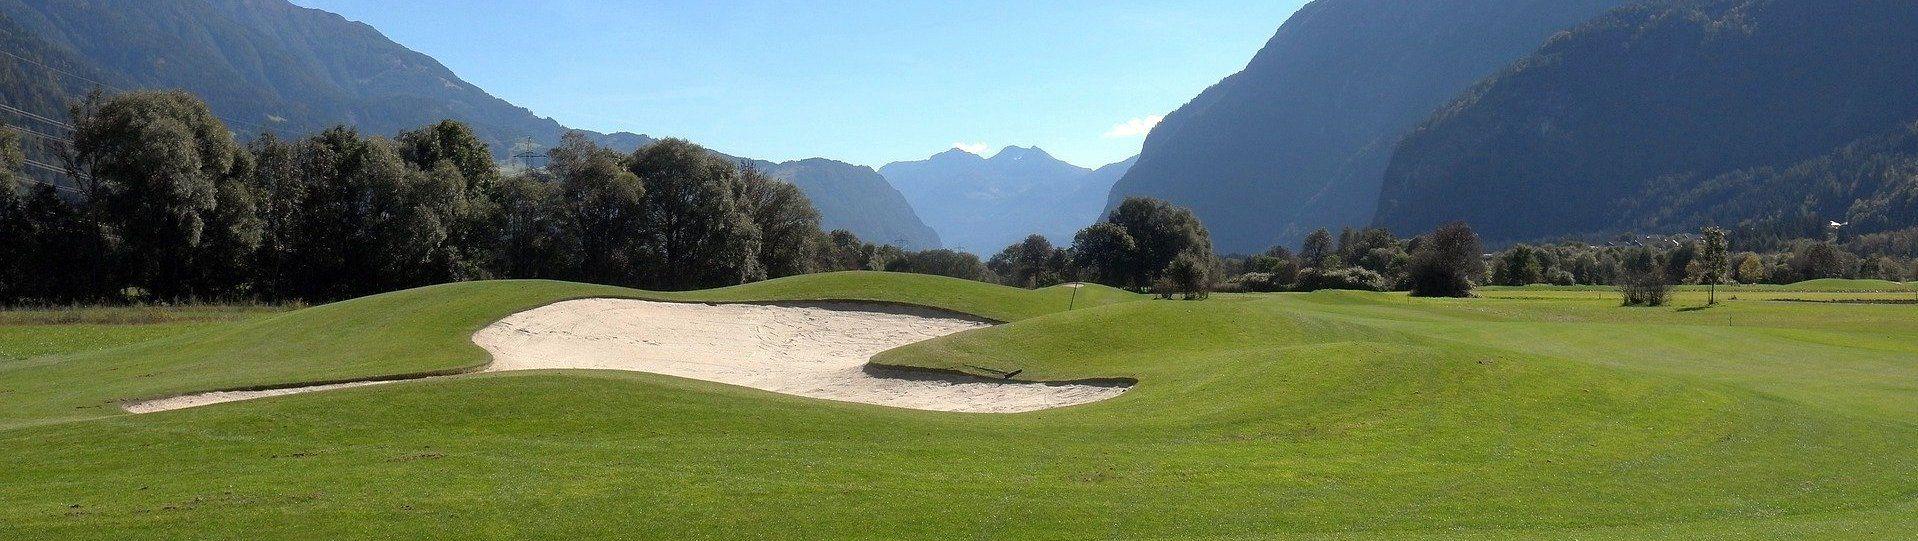 Golfclub Dolomitengolf Osttirol Lavant Lienz